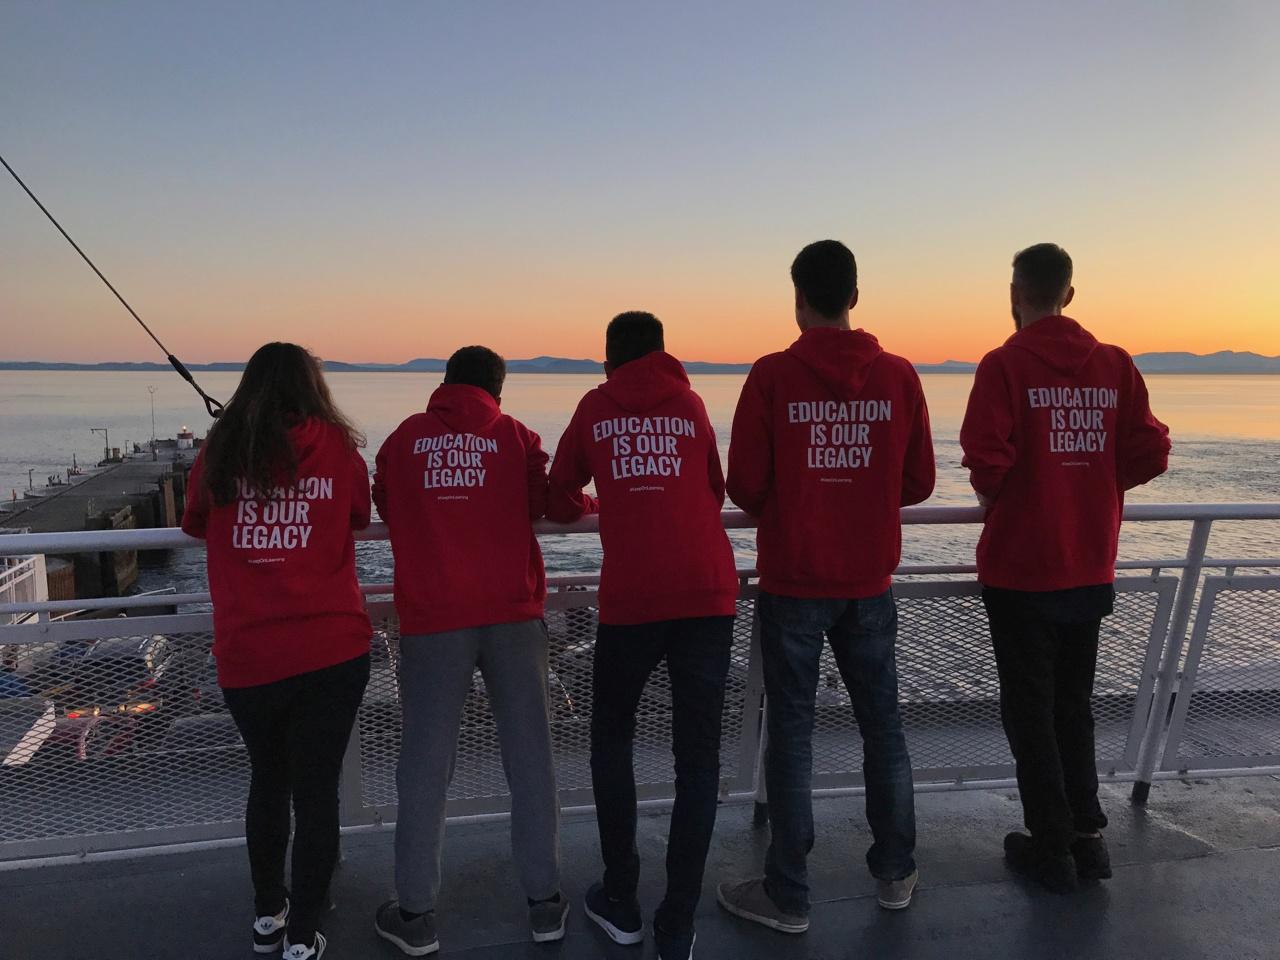 International students watching the sunset